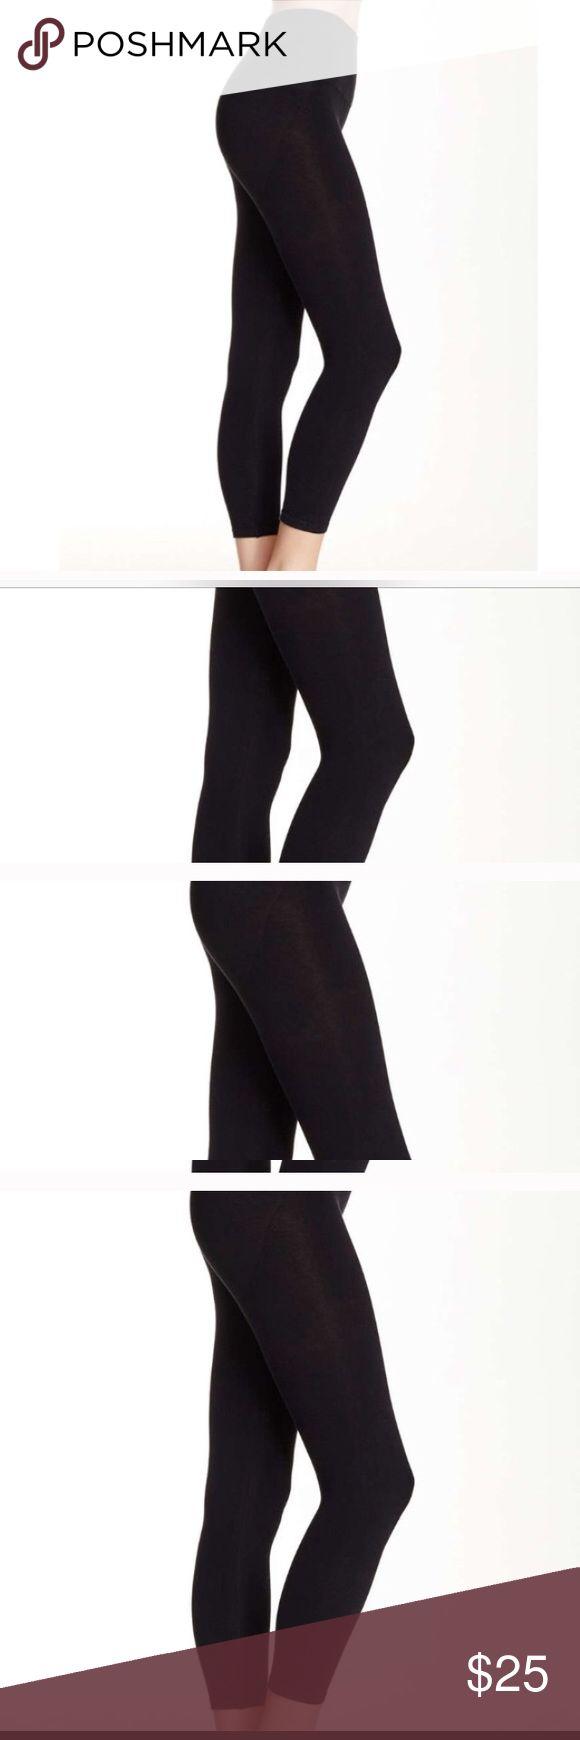 "NWOT assets leggings red hot label by spanx Soft, comfy assets leggings by Spanx....length 33"" ASSETS by Sara Blakely Pants Leggings"